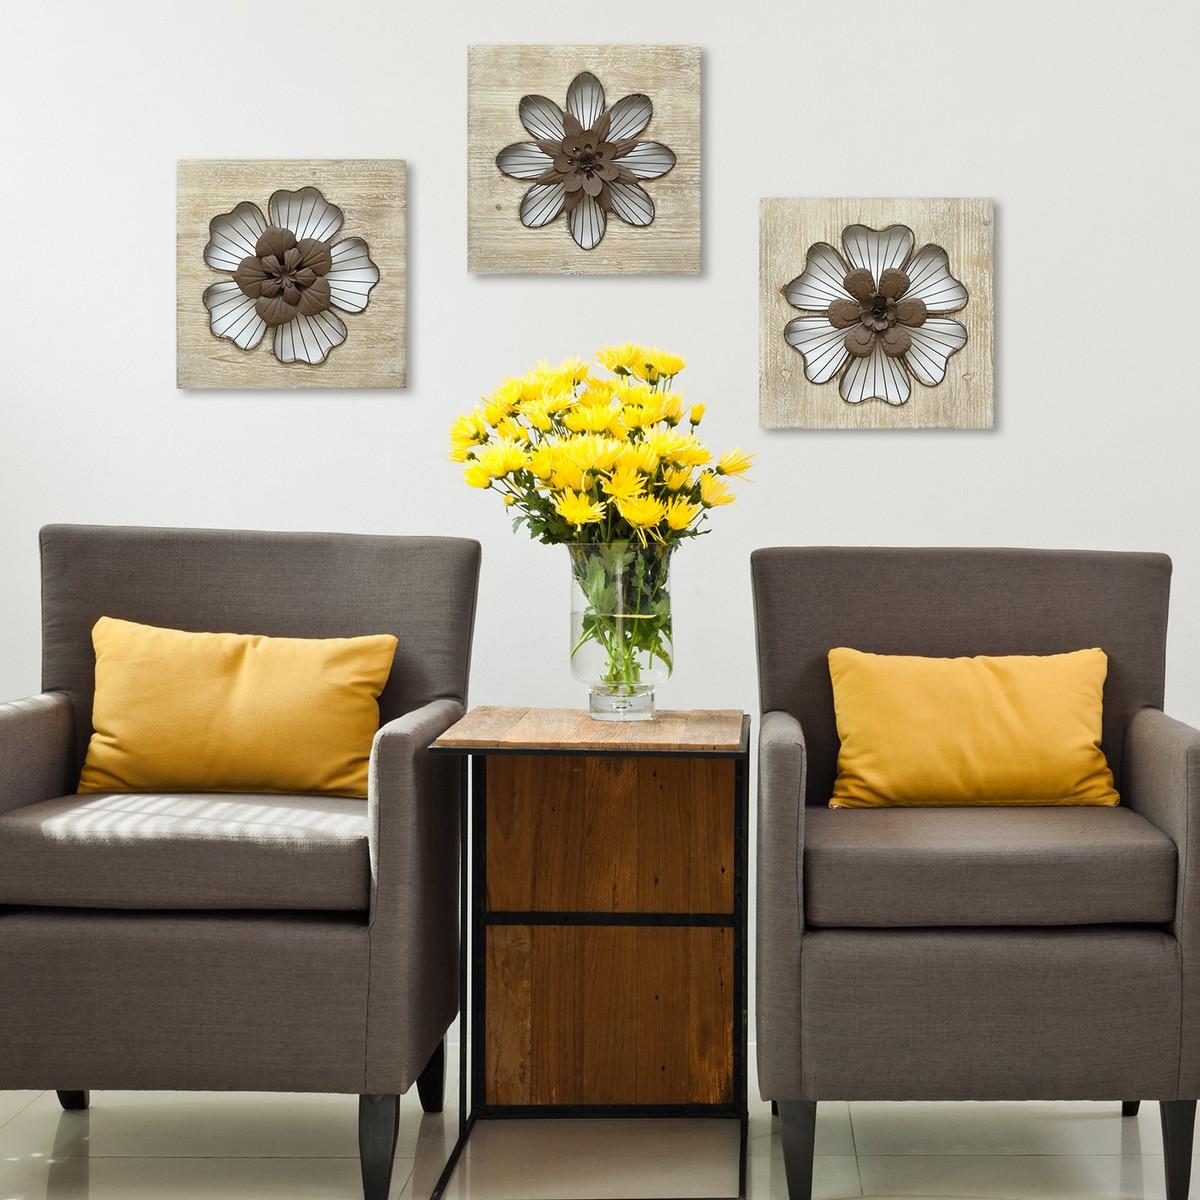 Stratton Home Decor Rustic Flower Wall Decor - Natural Wood/Espresso